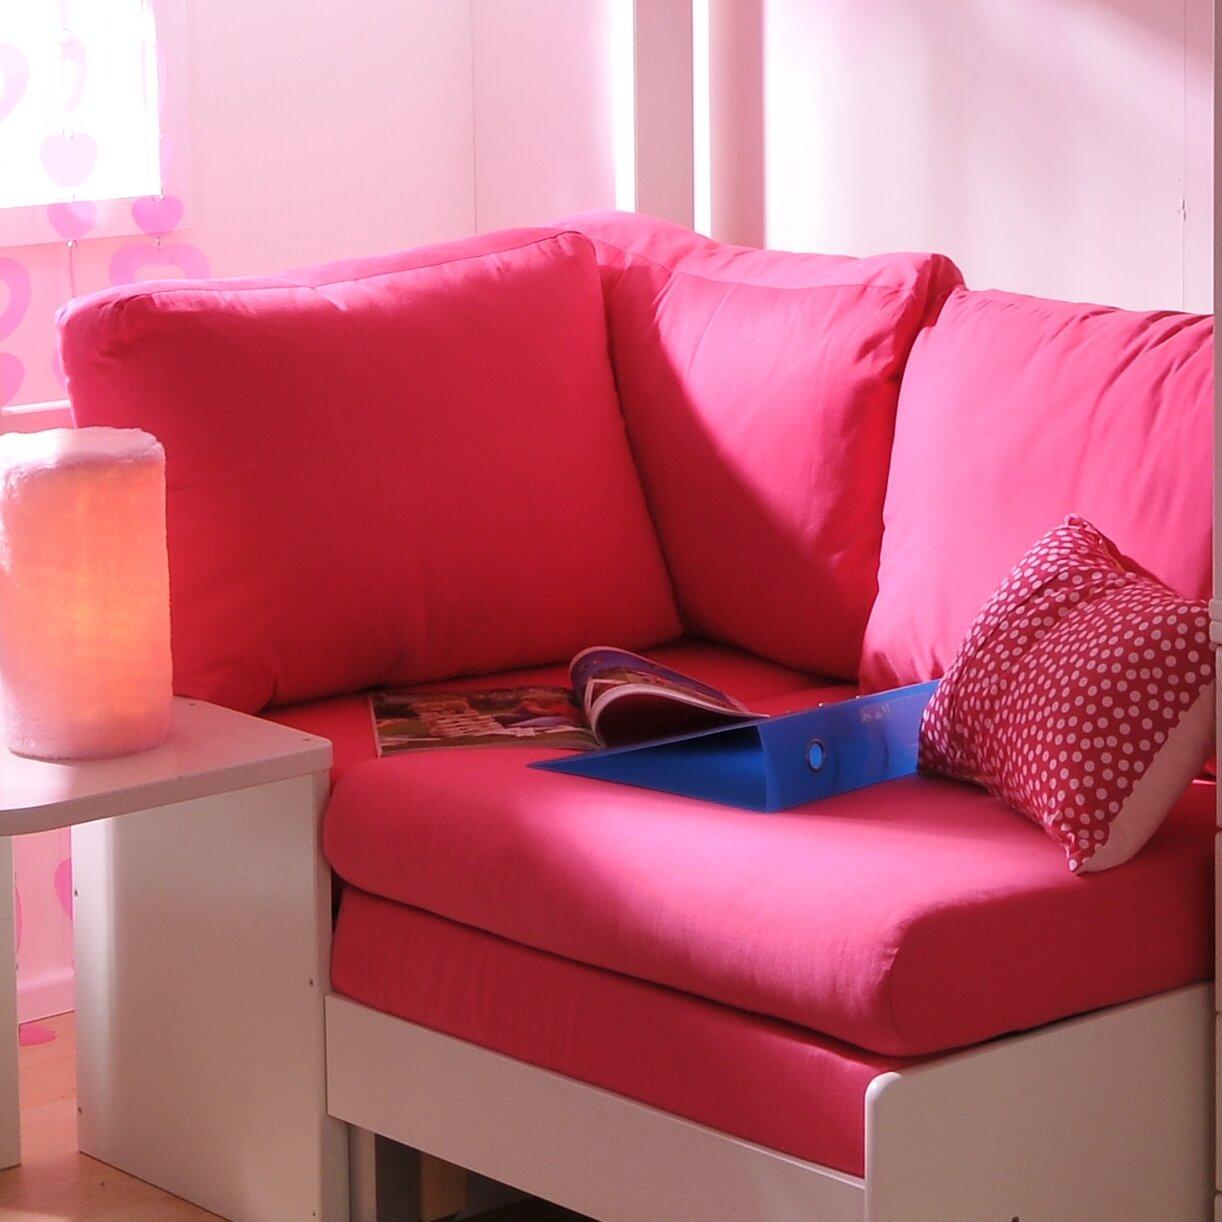 Stompa Single High Sleeper Bed with Storage | Wayfair UK